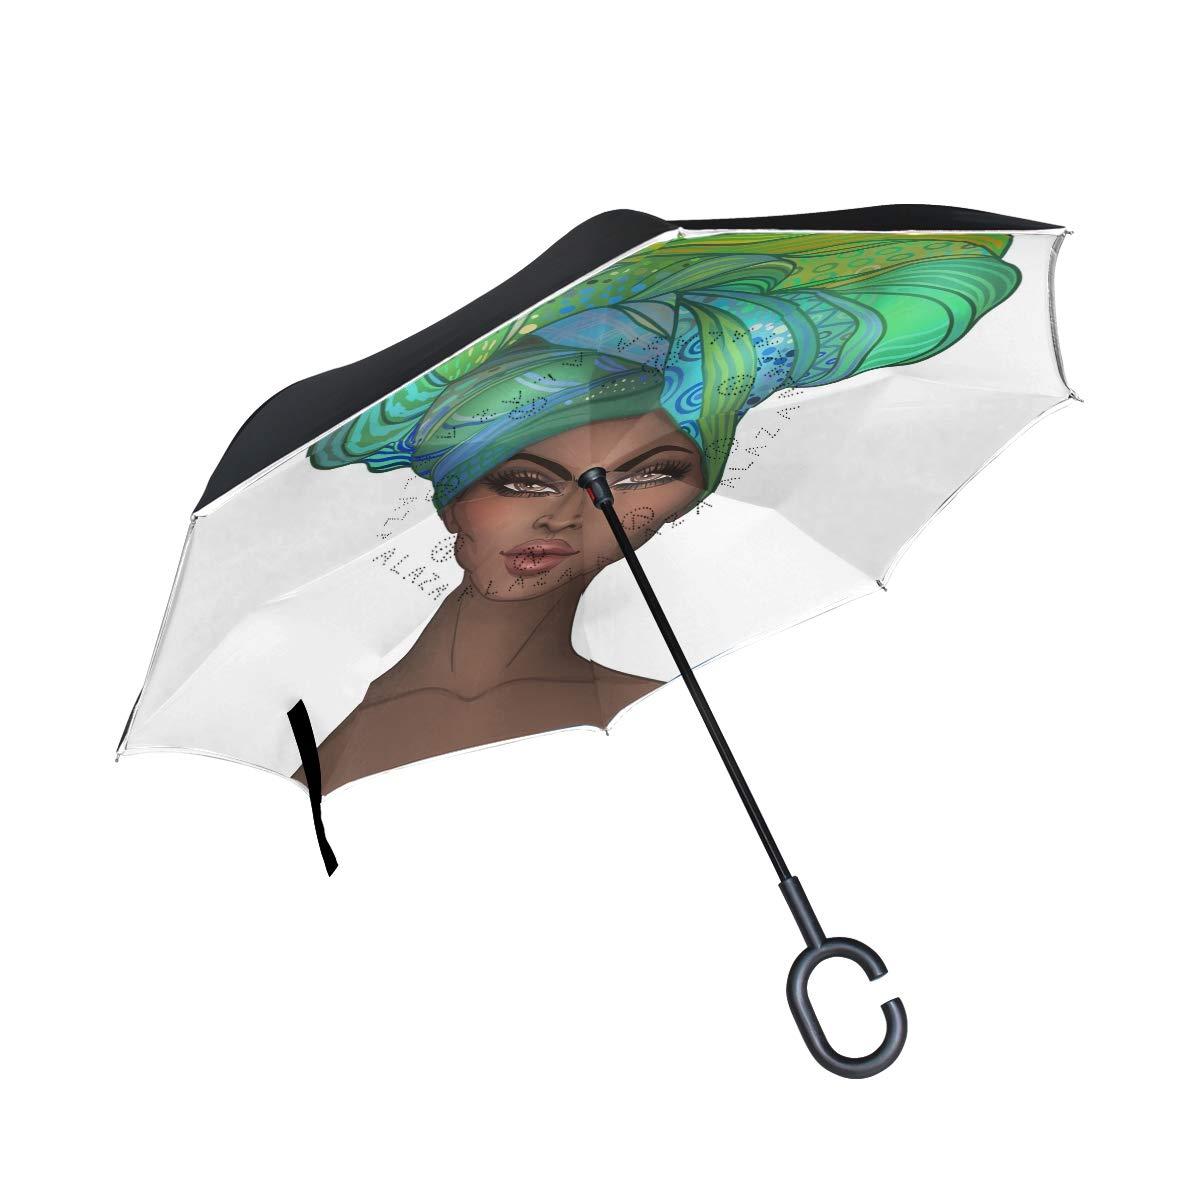 SUABO 逆さ傘 二層 逆折り傘 アフリカ系アメリカ人 かわいい女の子 防風傘 車 雨 屋外用 C型ハンドル付き   B07GV82C39